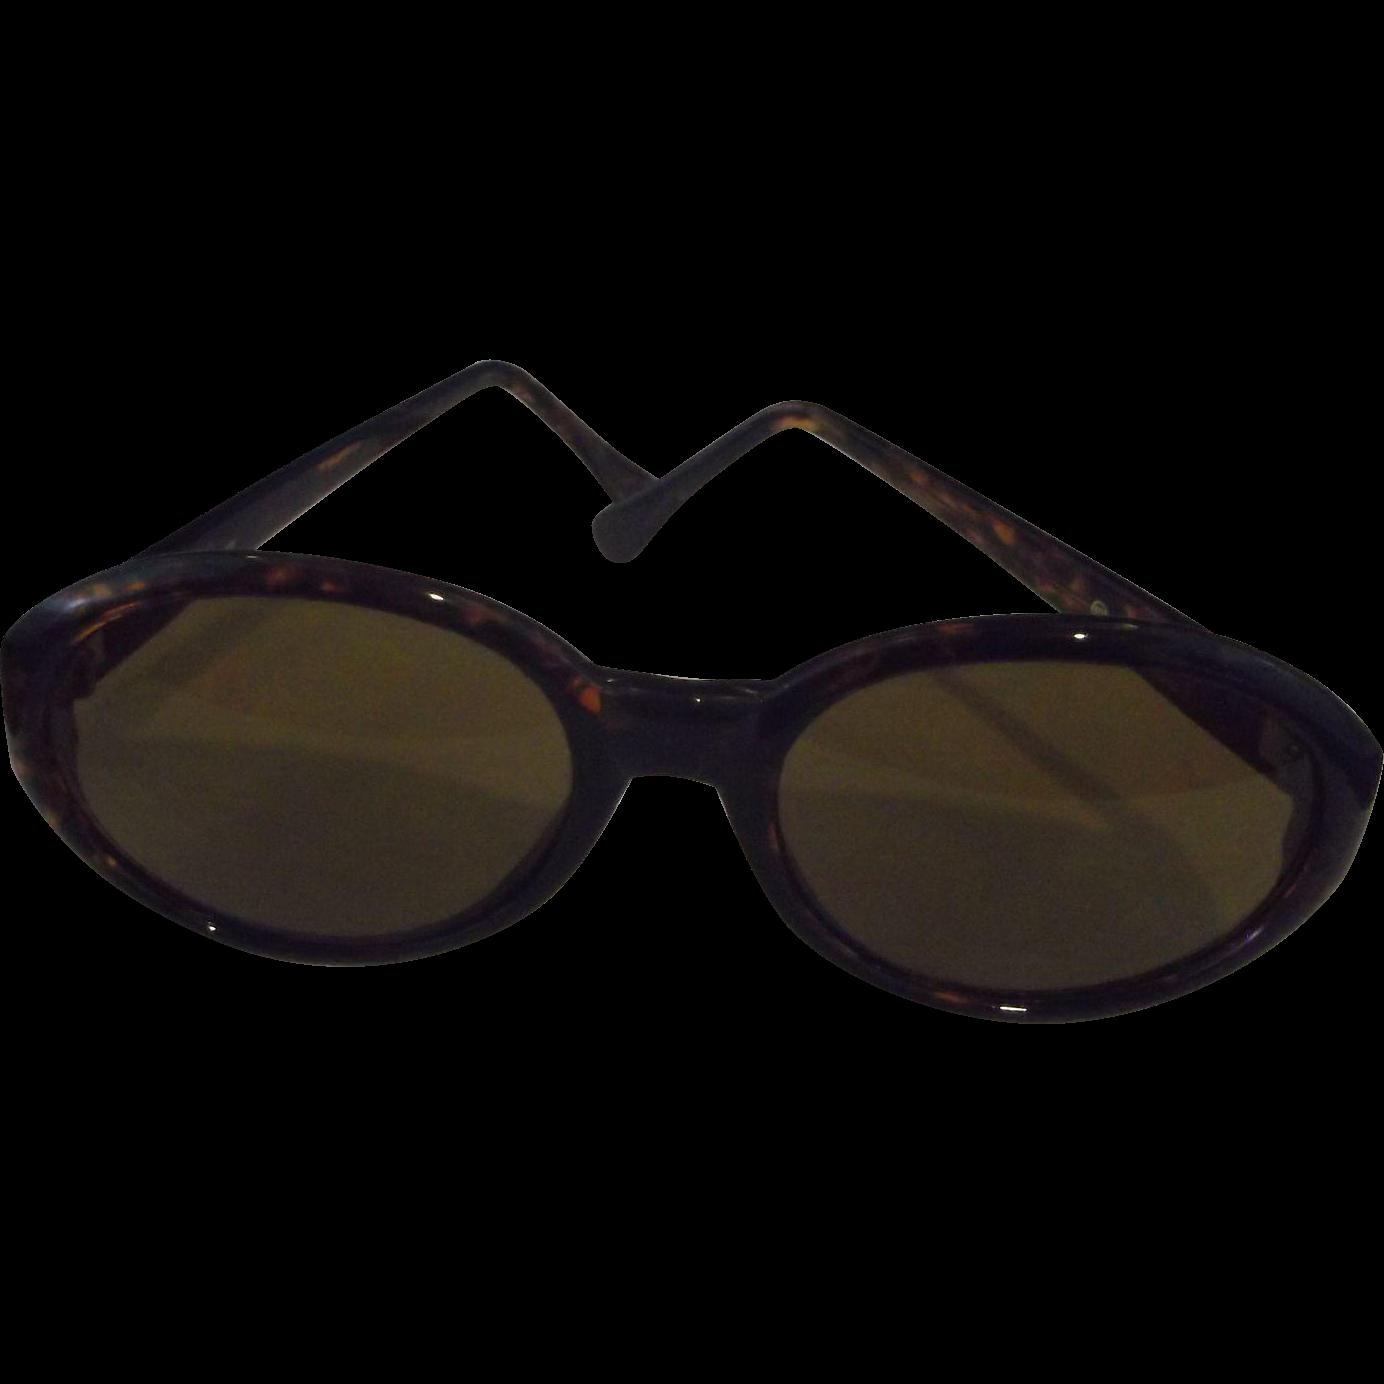 Taiwan Faux Tortoiseshell Sunglasses Round Frames